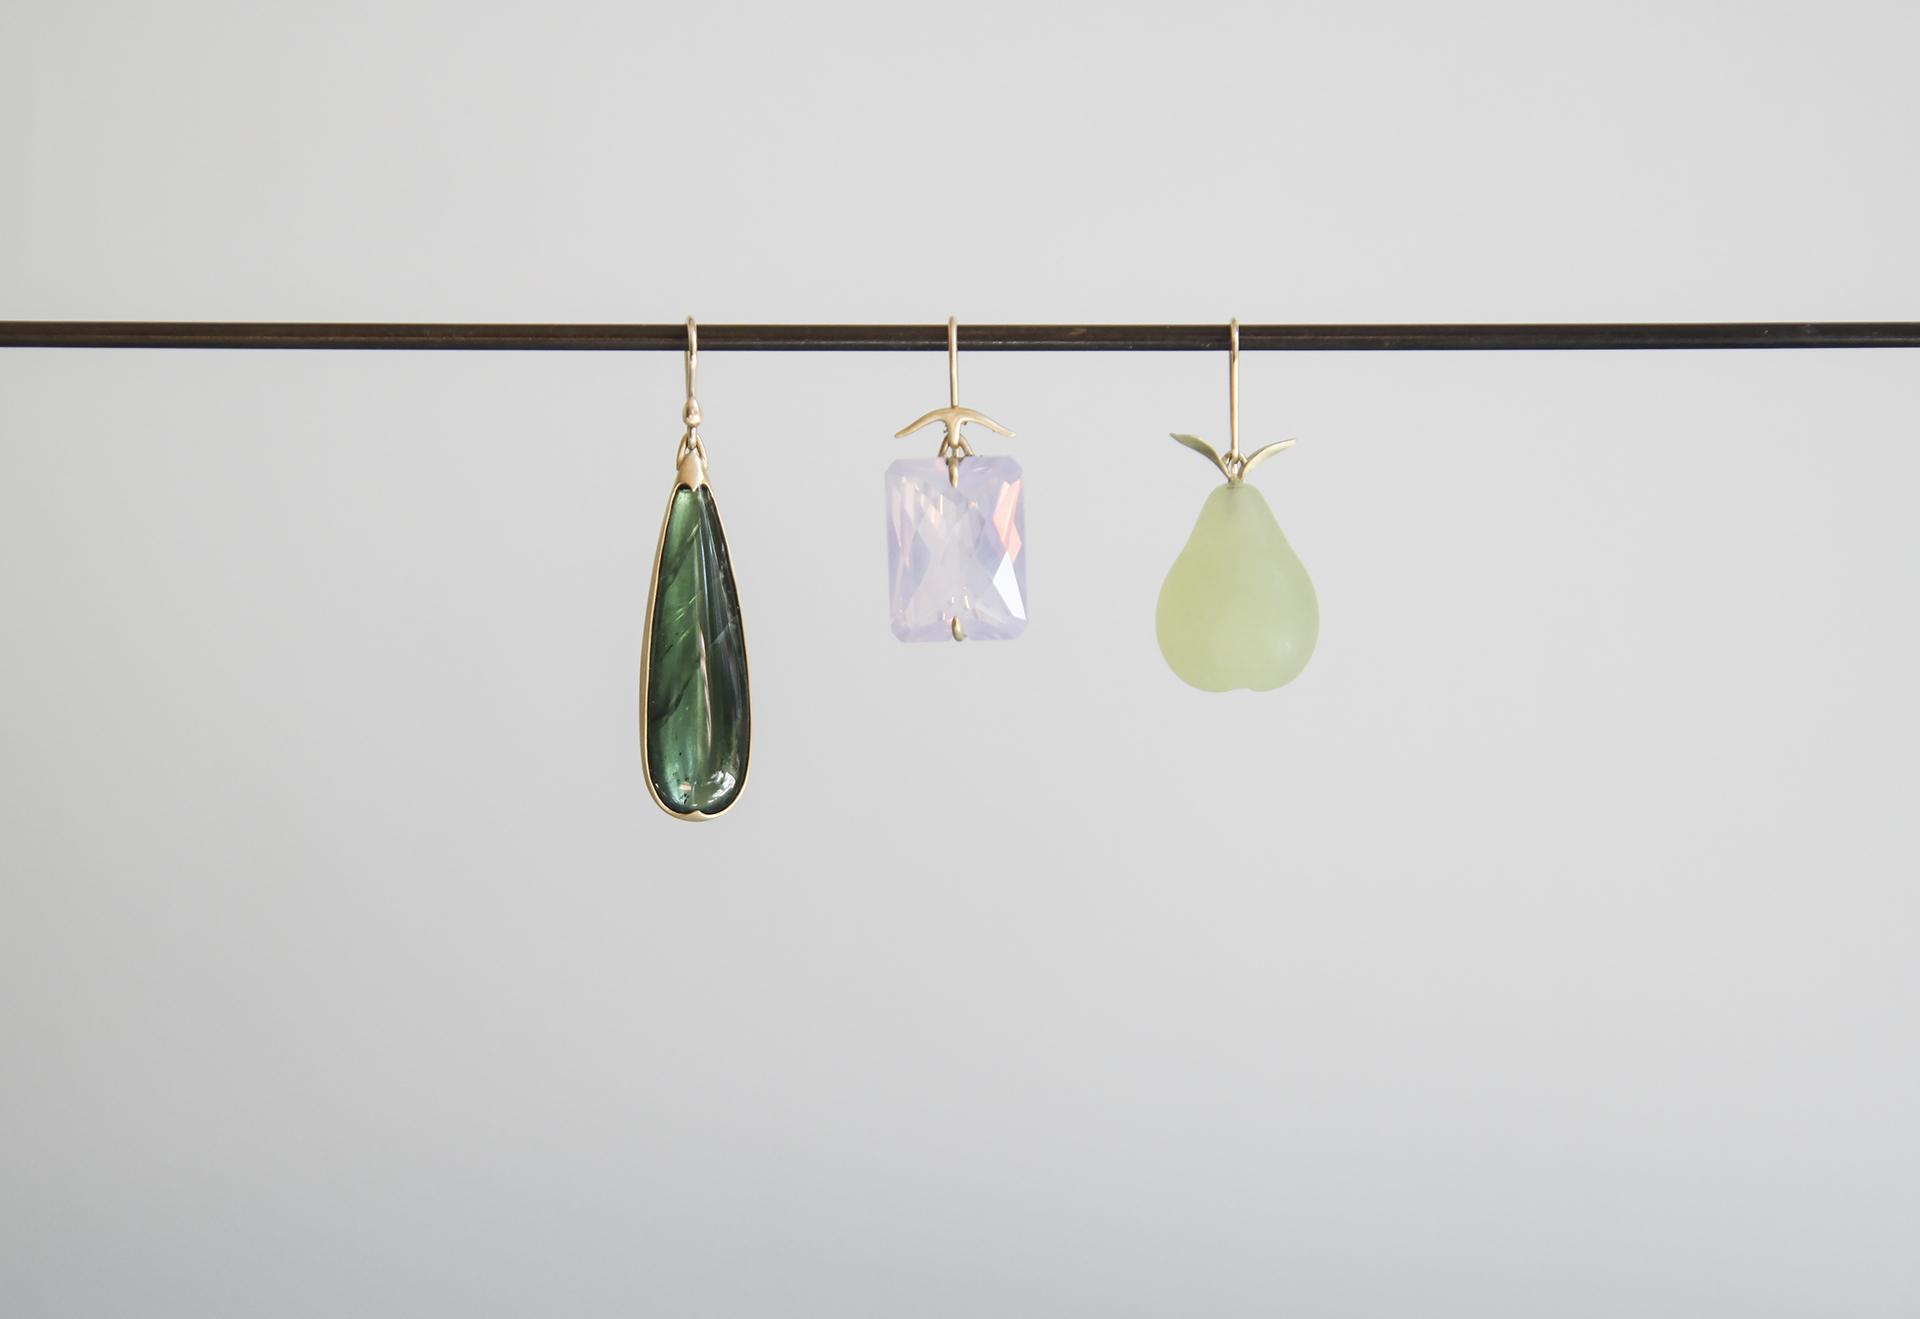 Green Tourmaline Drop Earring, Faceted Lavender Quartz Earring, Serpentine Pear Earring